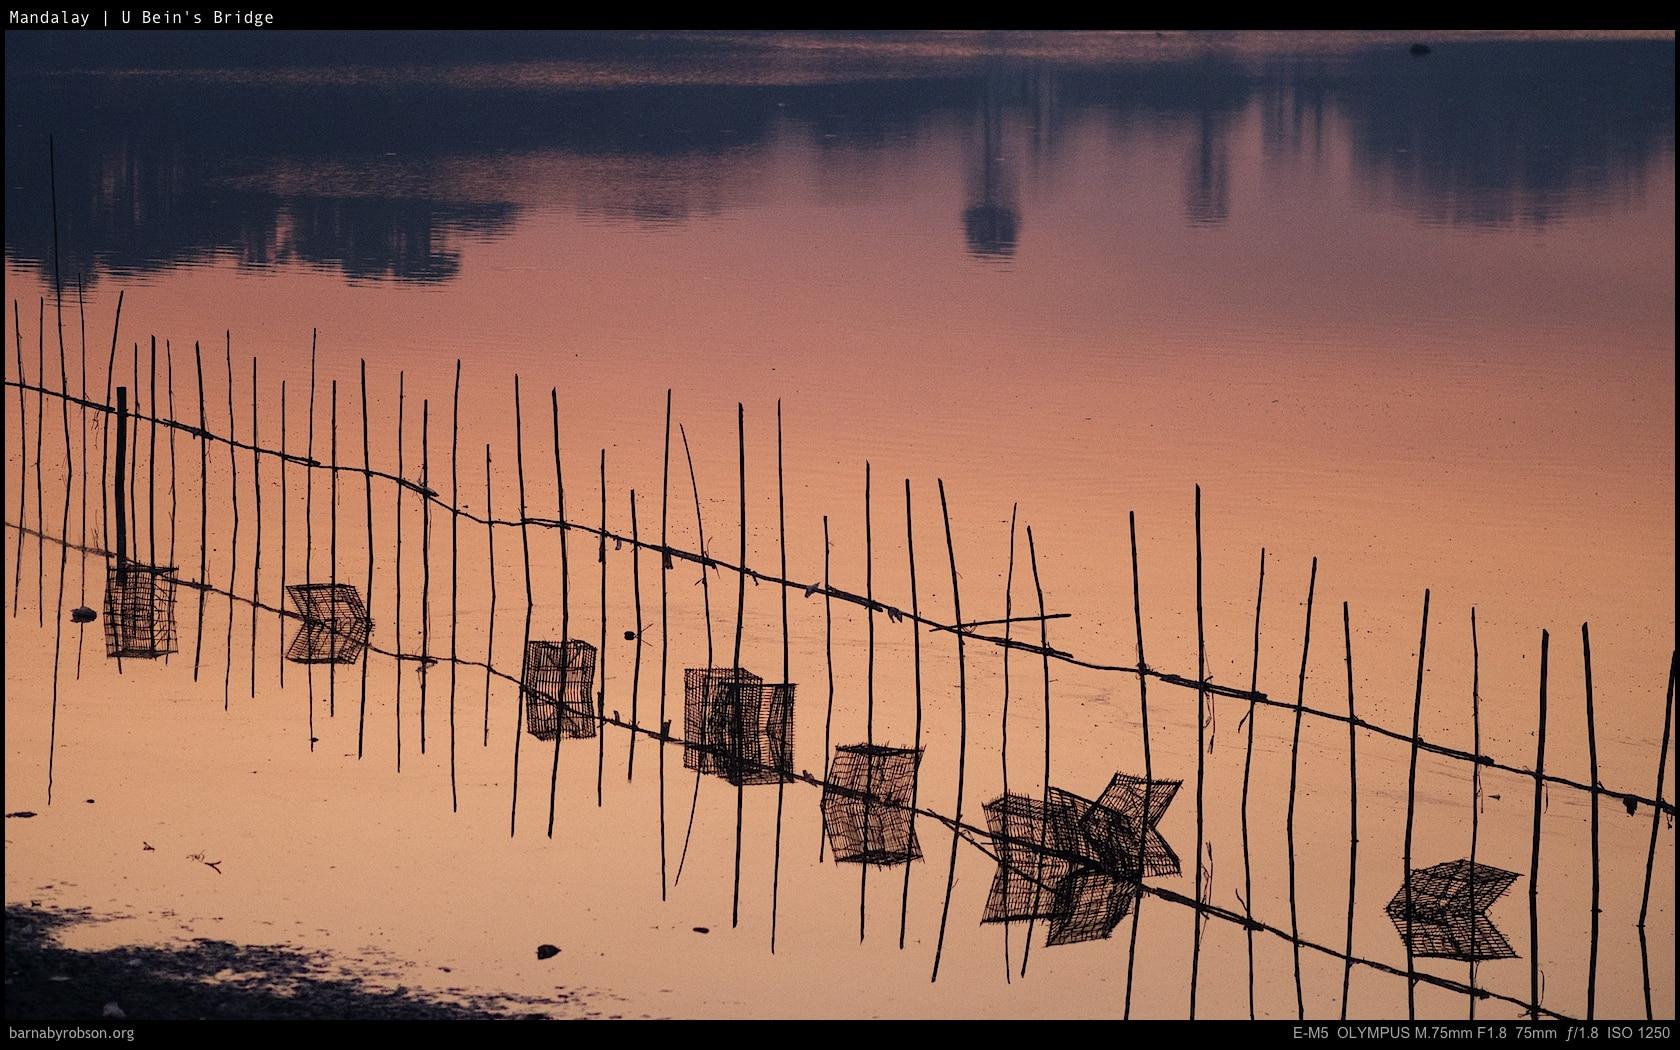 crop 1680*1050_Mandalay_ 047_